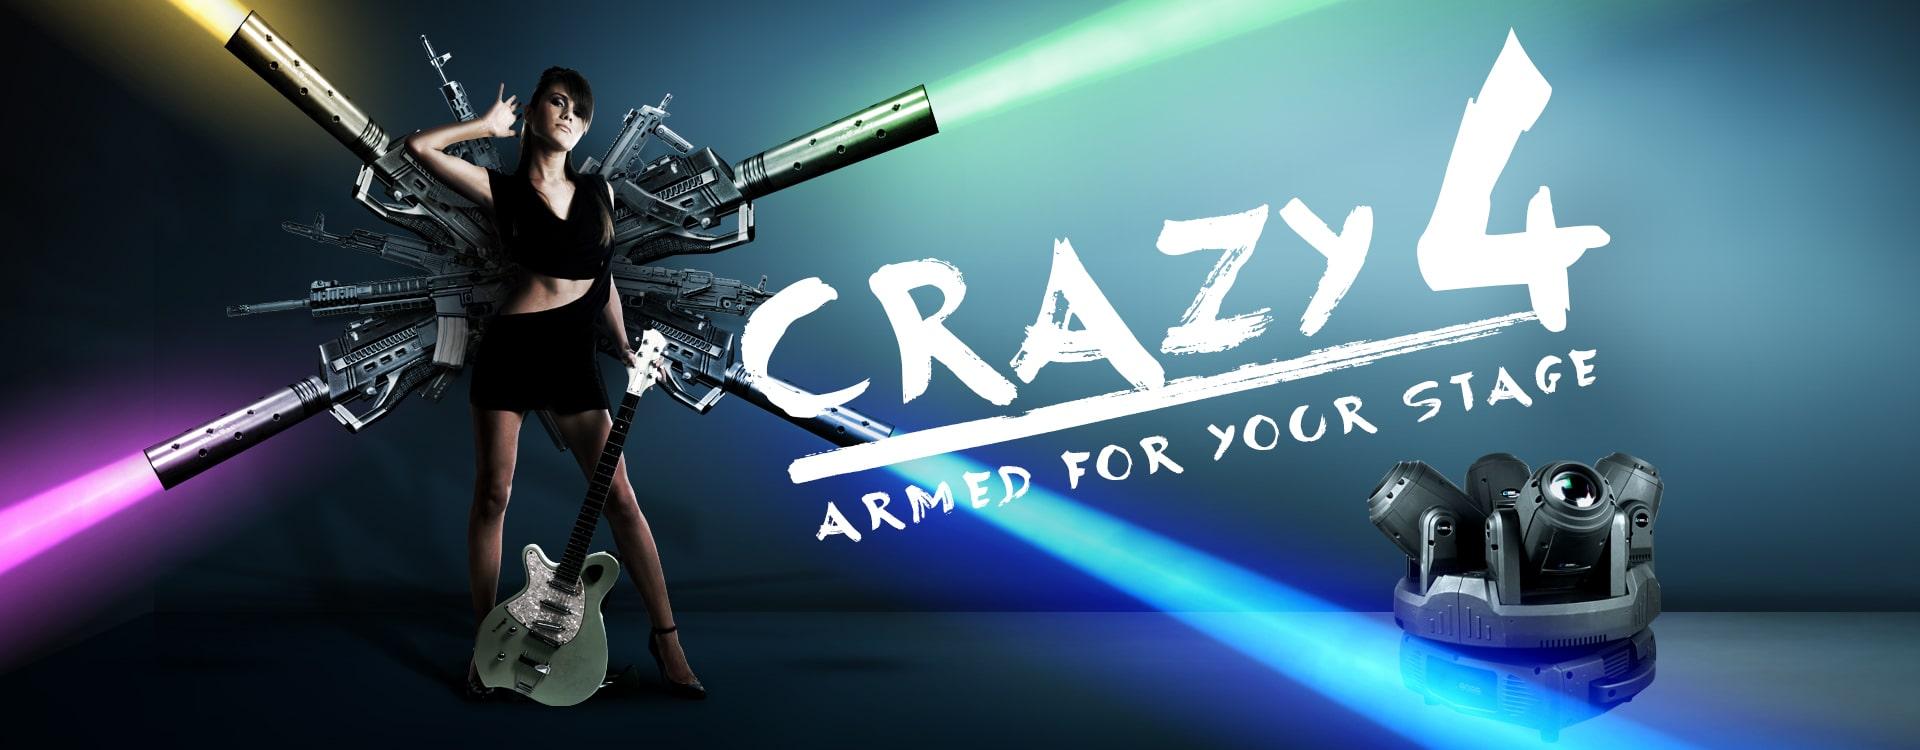 CRAZY-4.jpg